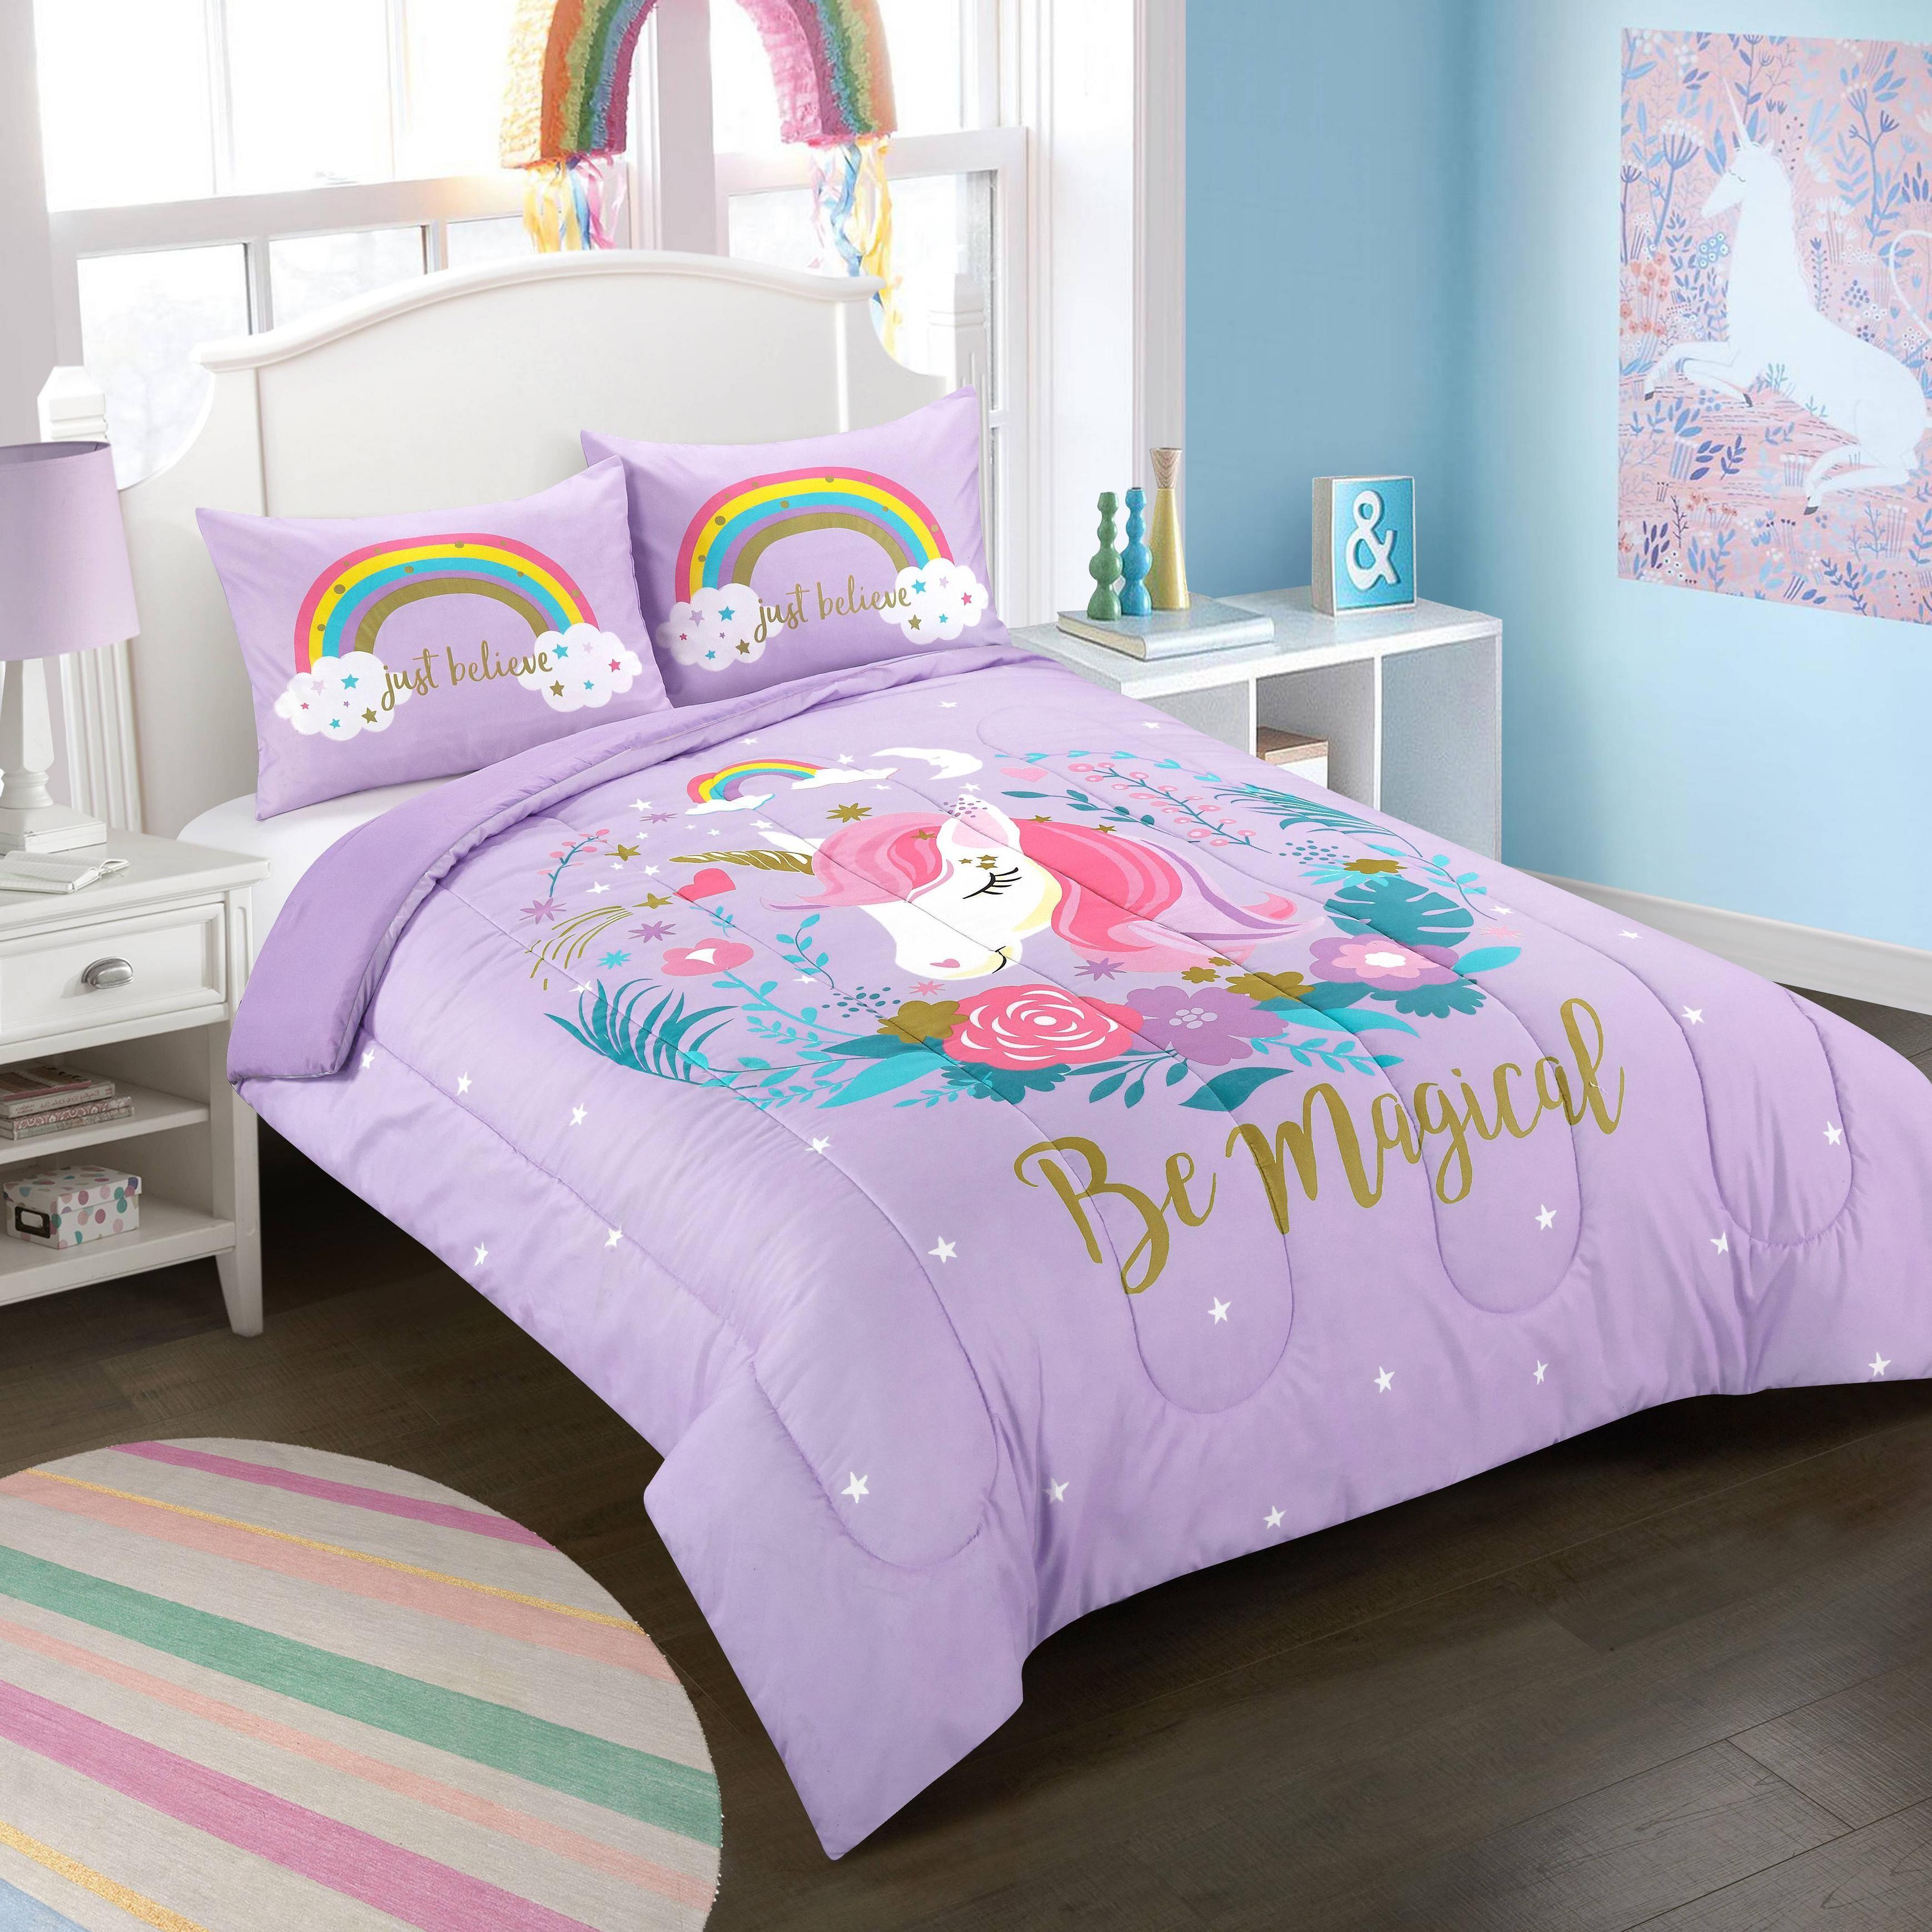 Heritage Club Panel Printed Unicorn Comforter Set Walmart Com Bed For Girls Room Unicorn Bed Set Girl Bedroom Decor